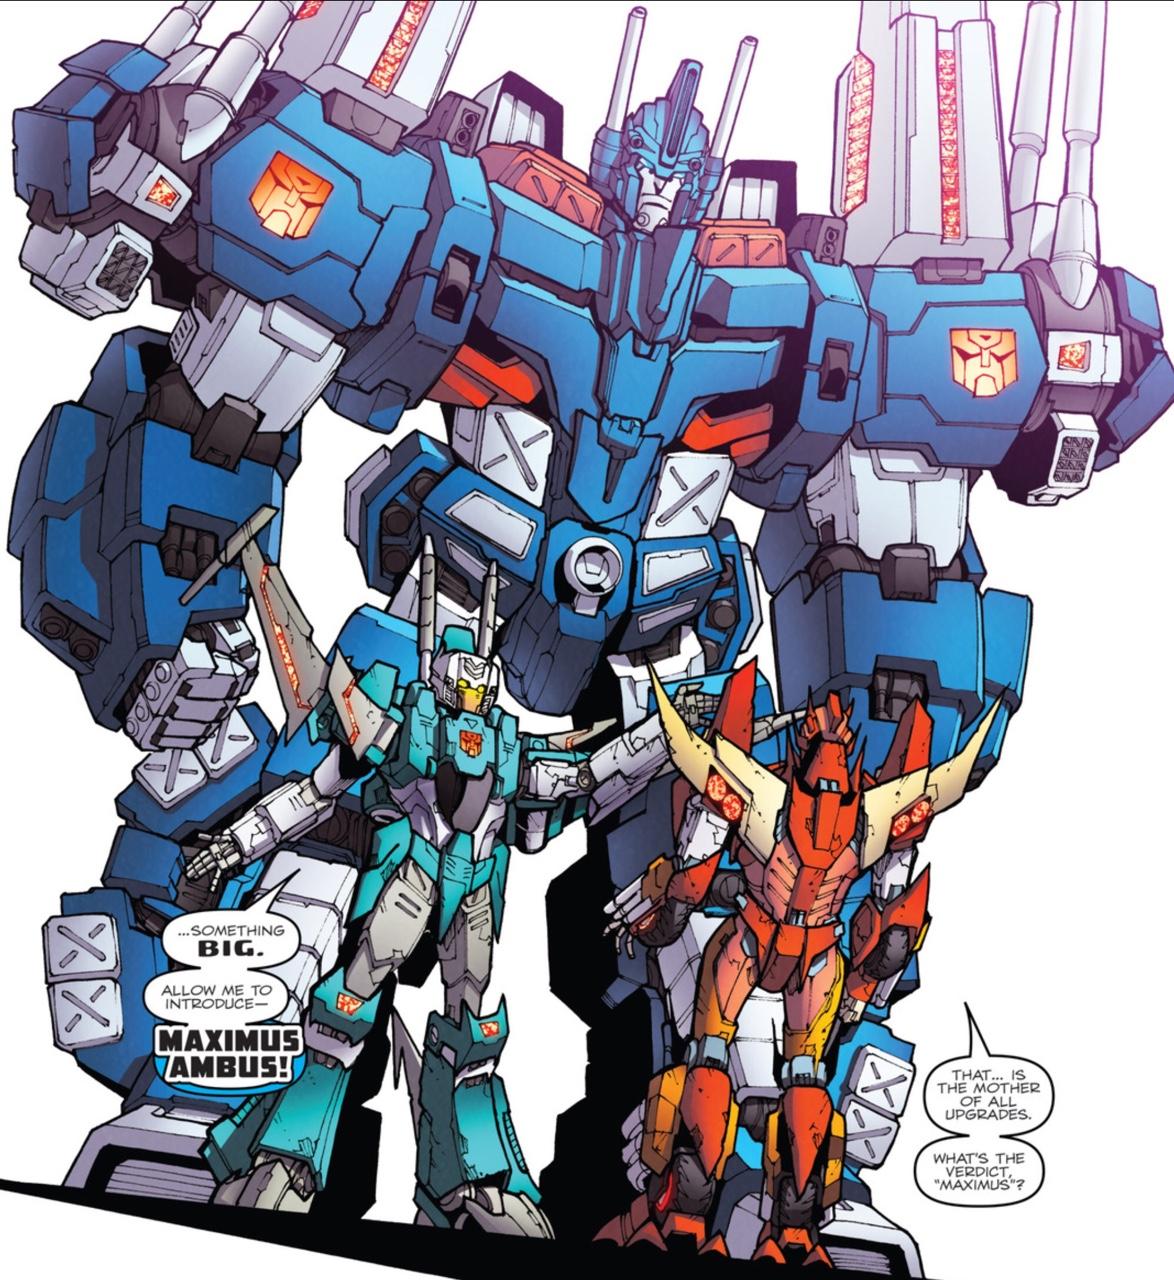 Maximus Ambus Transformers Know Your Meme